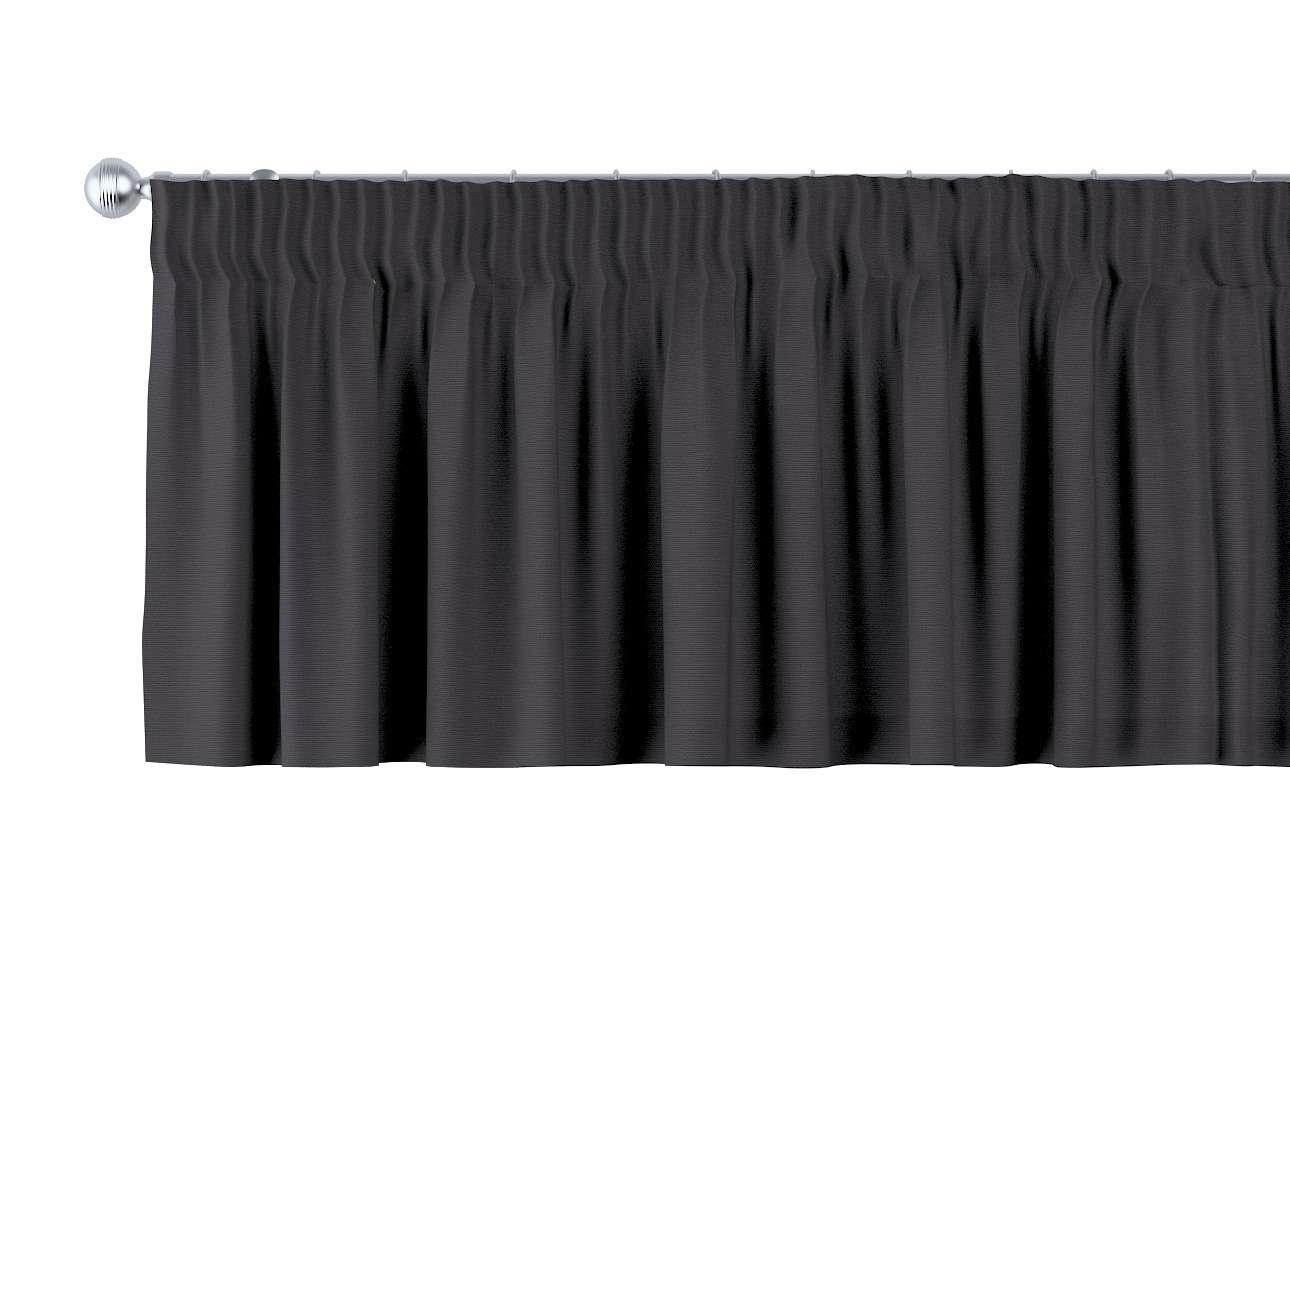 Kurzgardine mit Kräuselband 130 x 40 cm von der Kollektion Cotton Panama, Stoff: 702-08